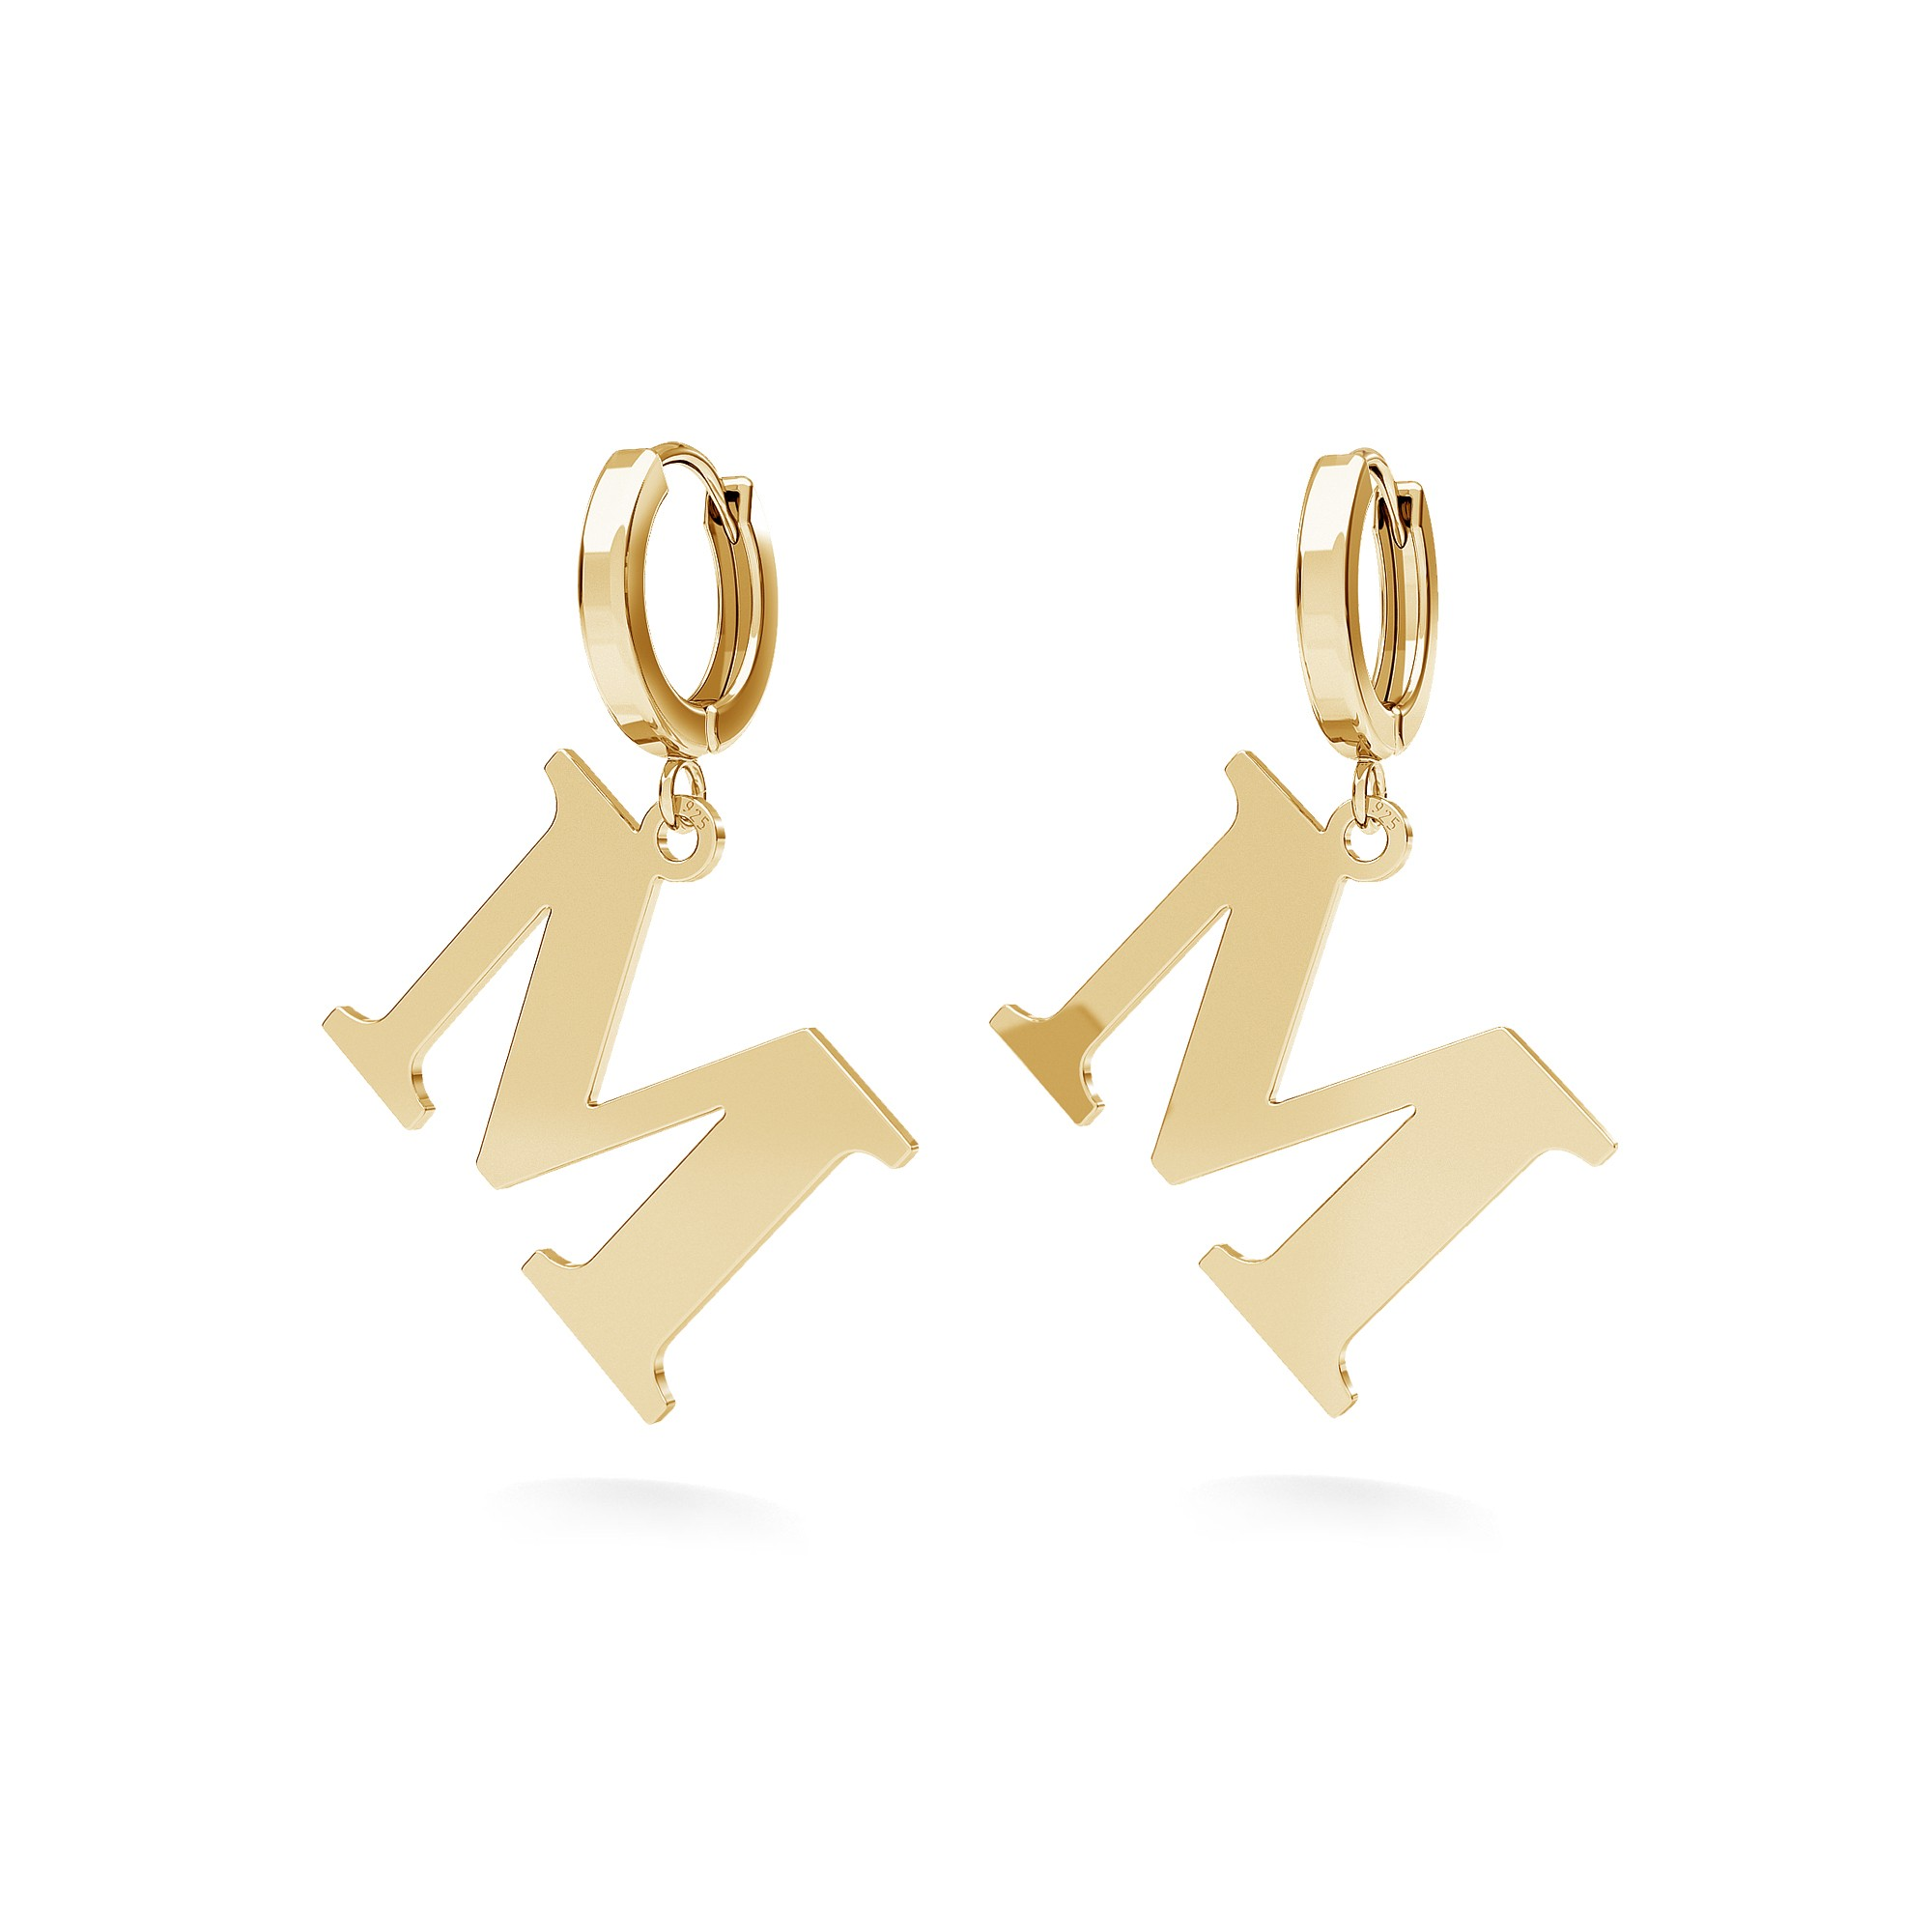 Letter earrings sterling silver 925